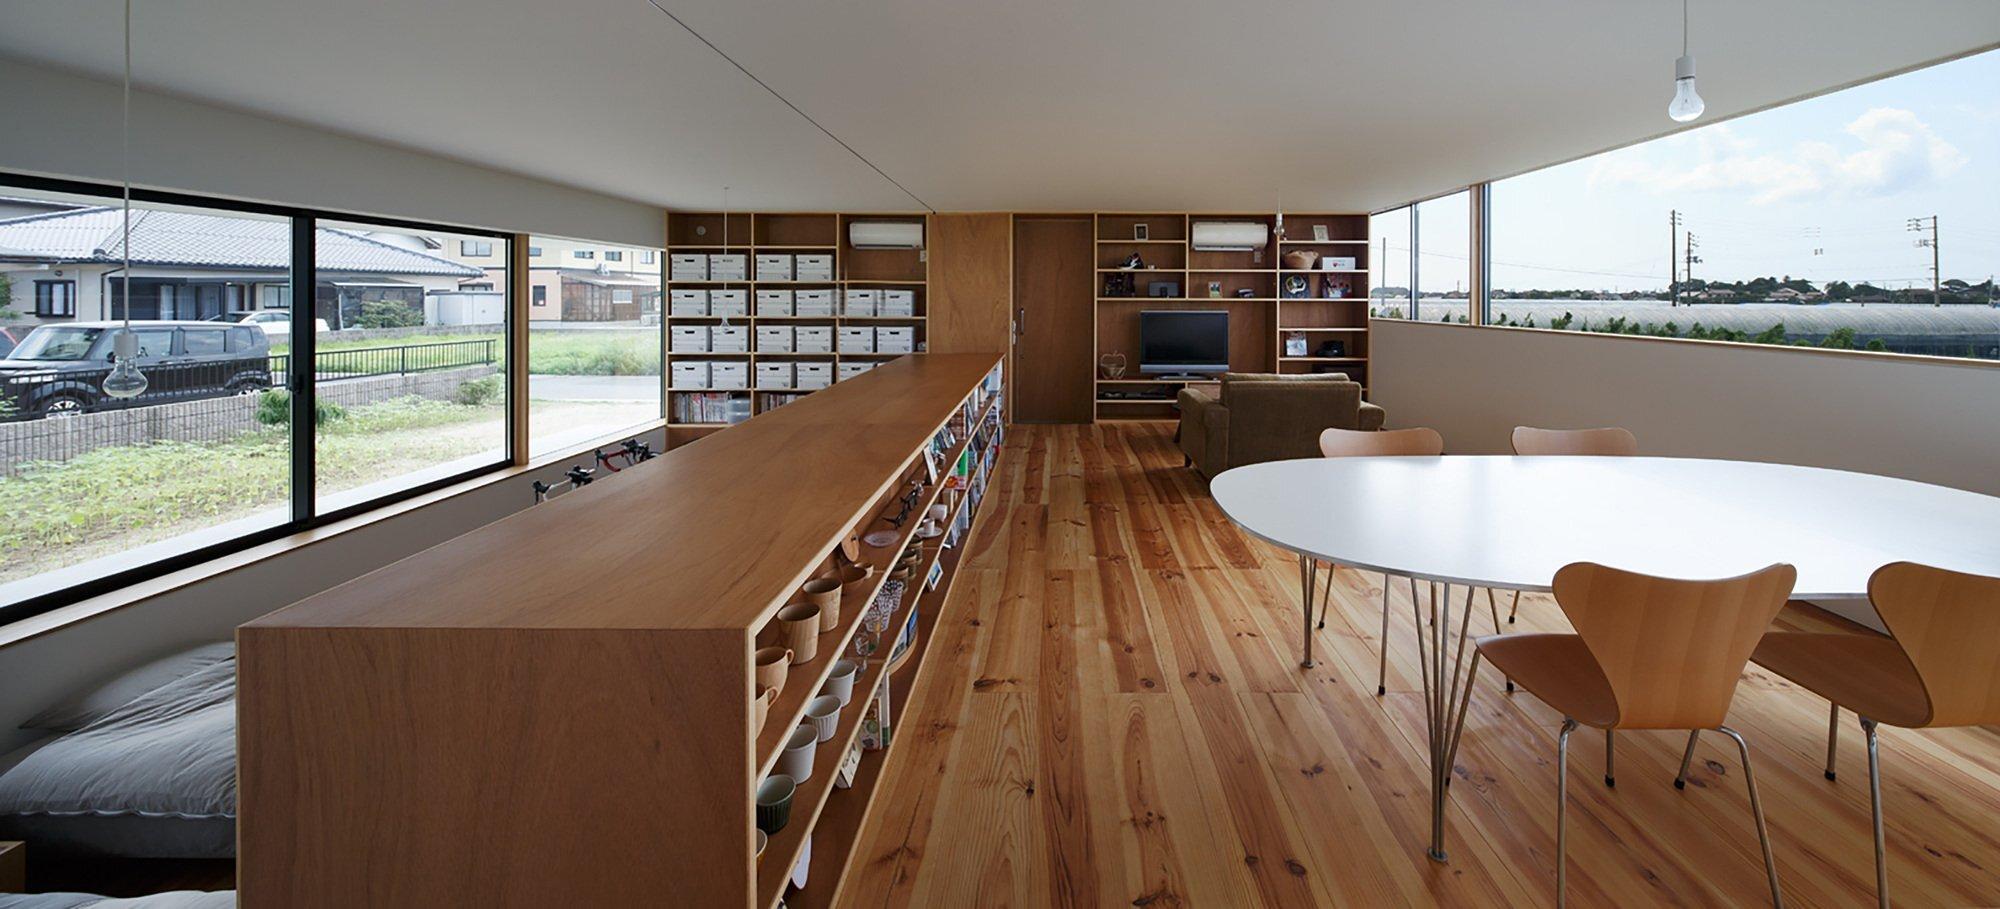 Gui House - Japanese House - Harunatsu-Arch - Shimane Japan - Windows - Humble Homes